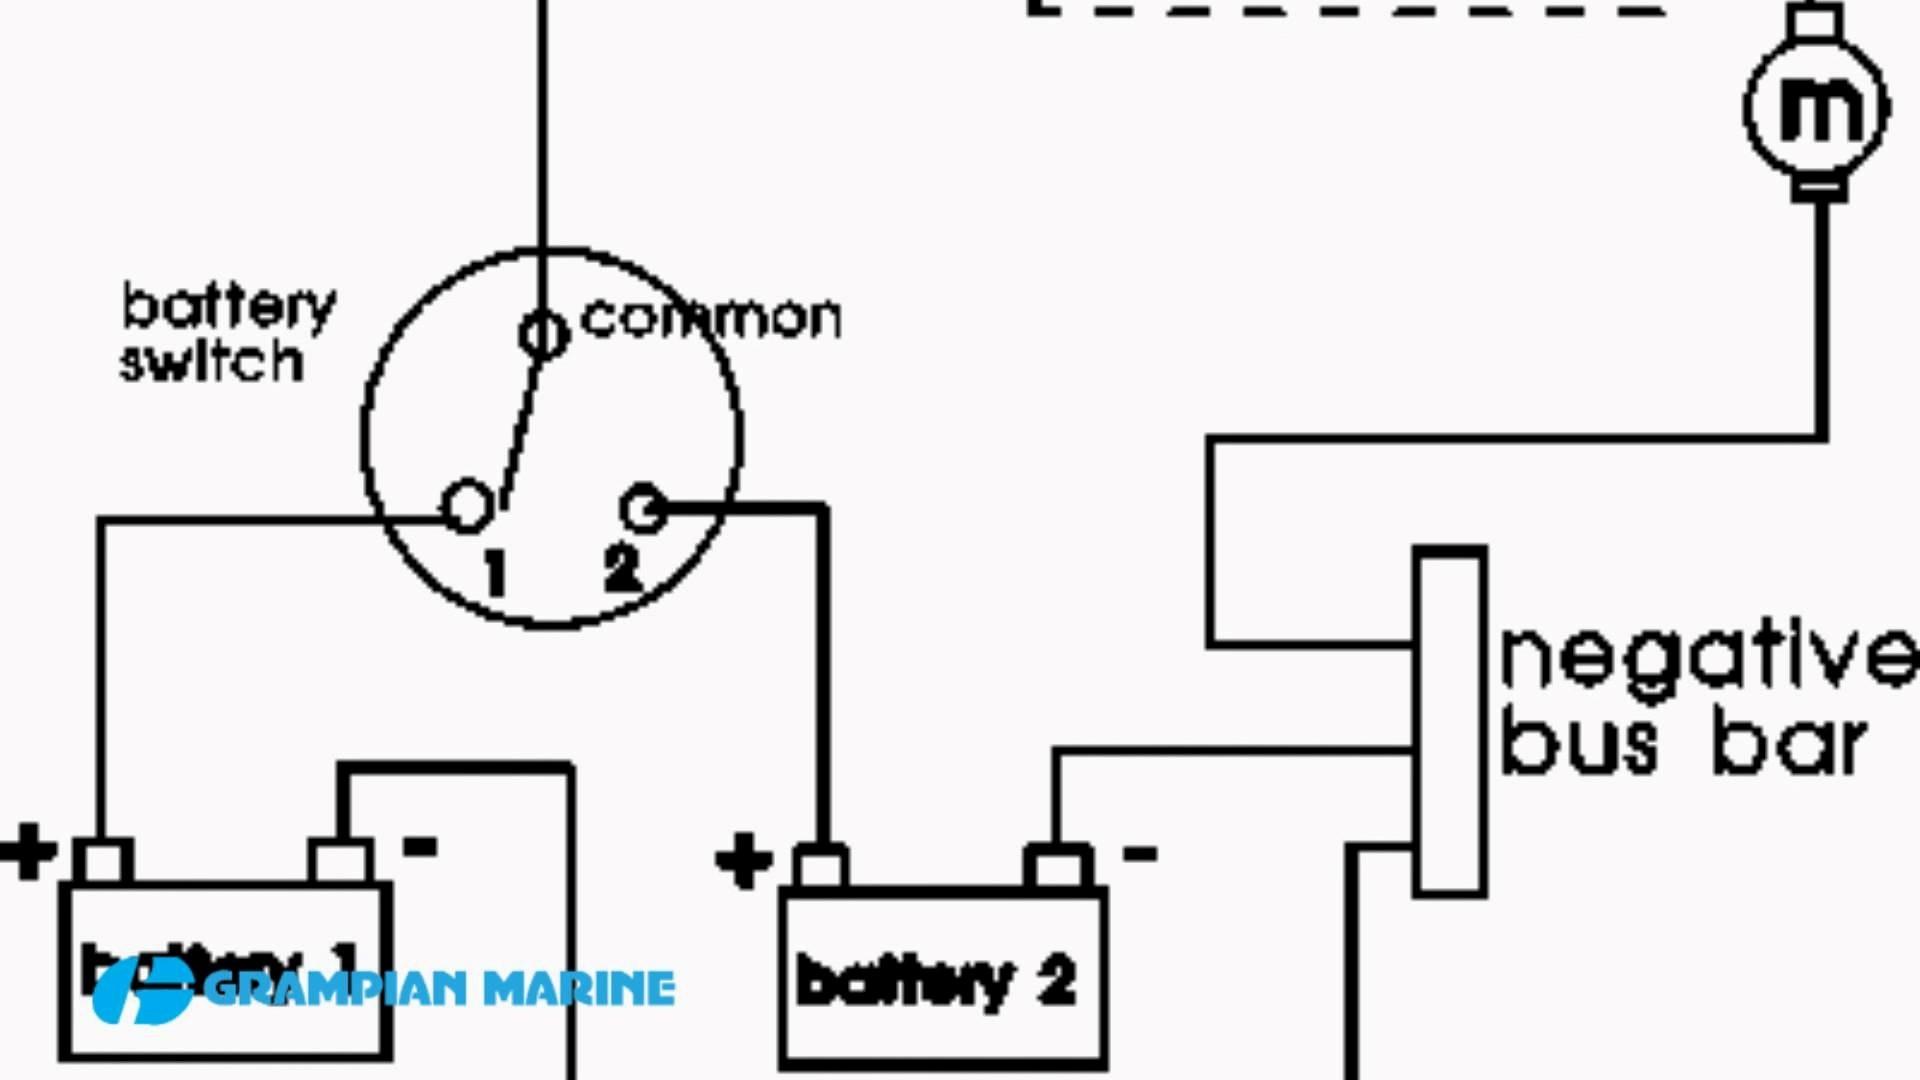 Dual Alternator Battery Isolator Wiring Diagram Handyman How To - Battery Isolator Wiring Diagram